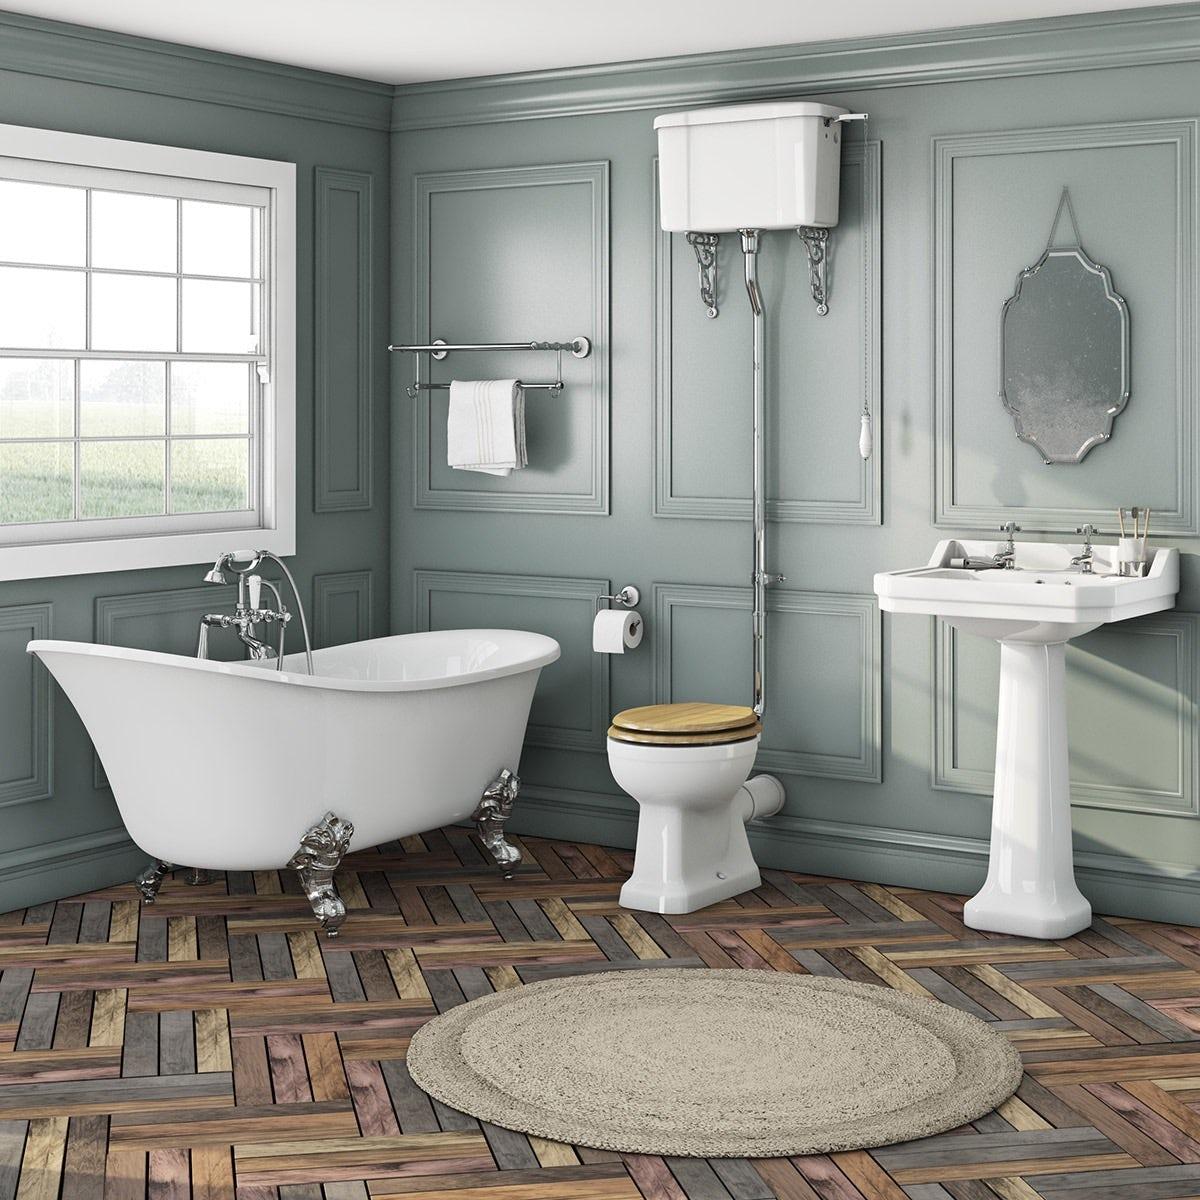 View our Range of Complete Bathroom Suites  VictoriaPlumcom